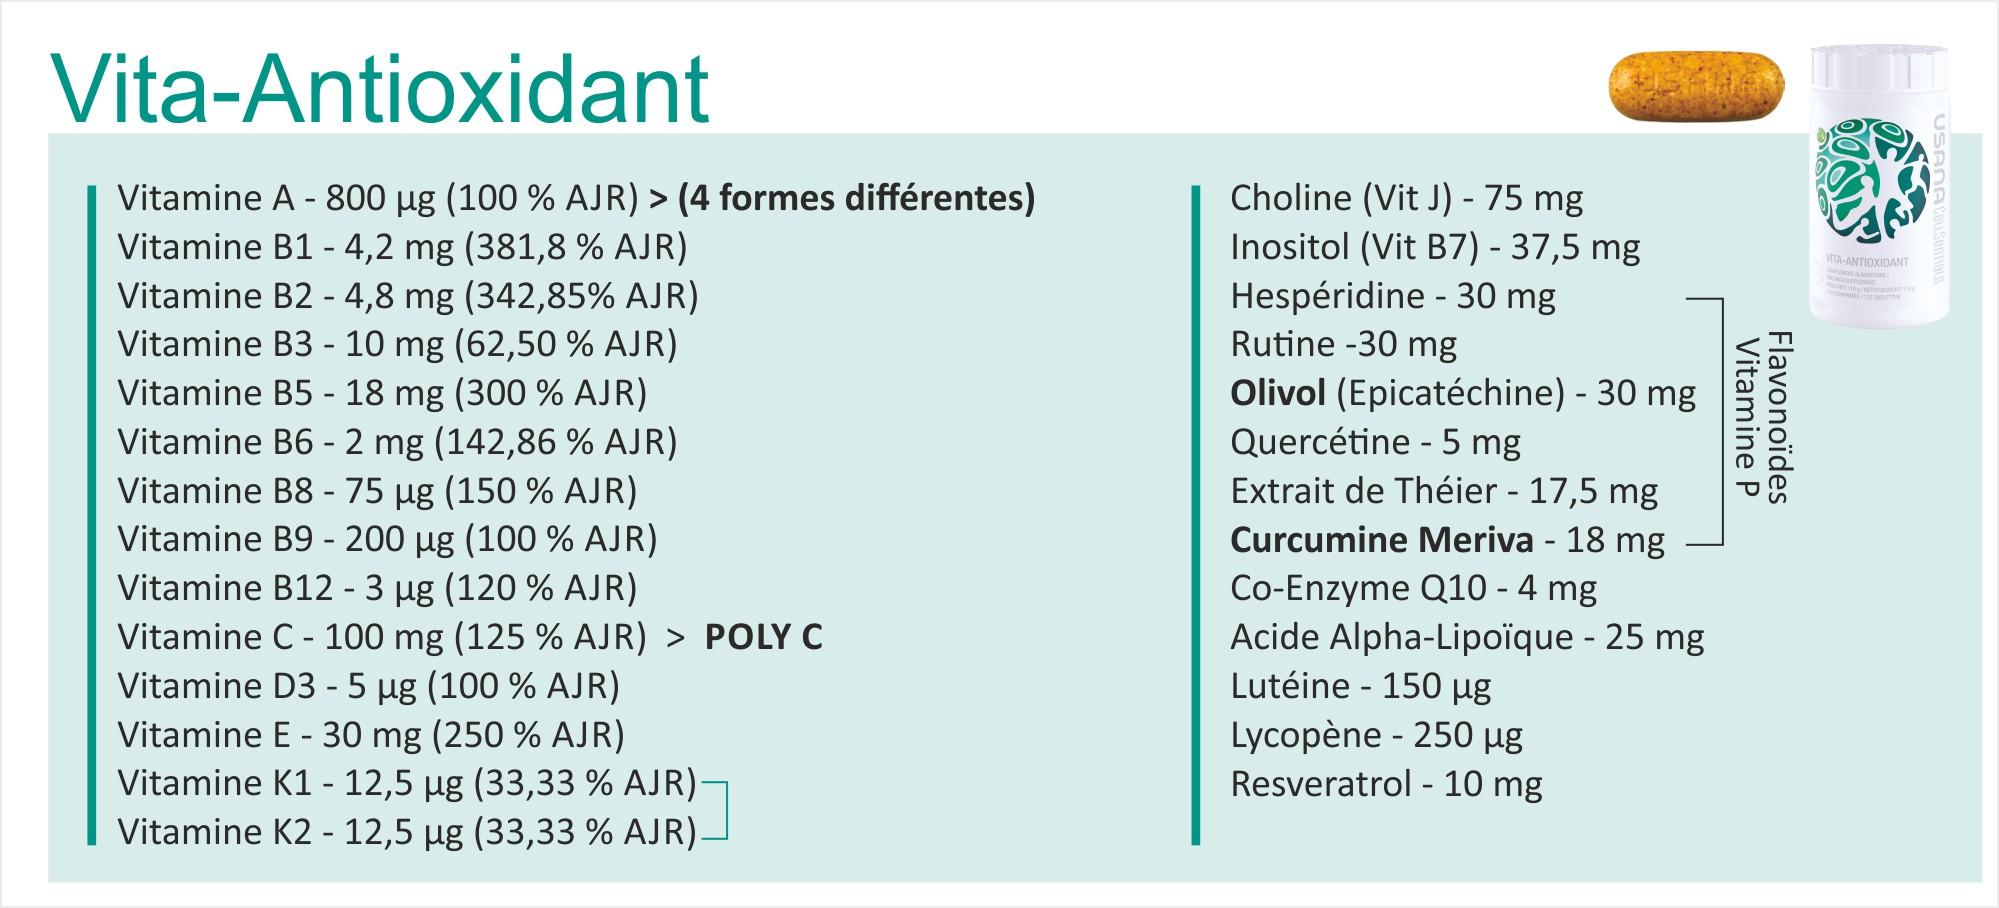 Vita-antioxydant - ingrédients - USANA